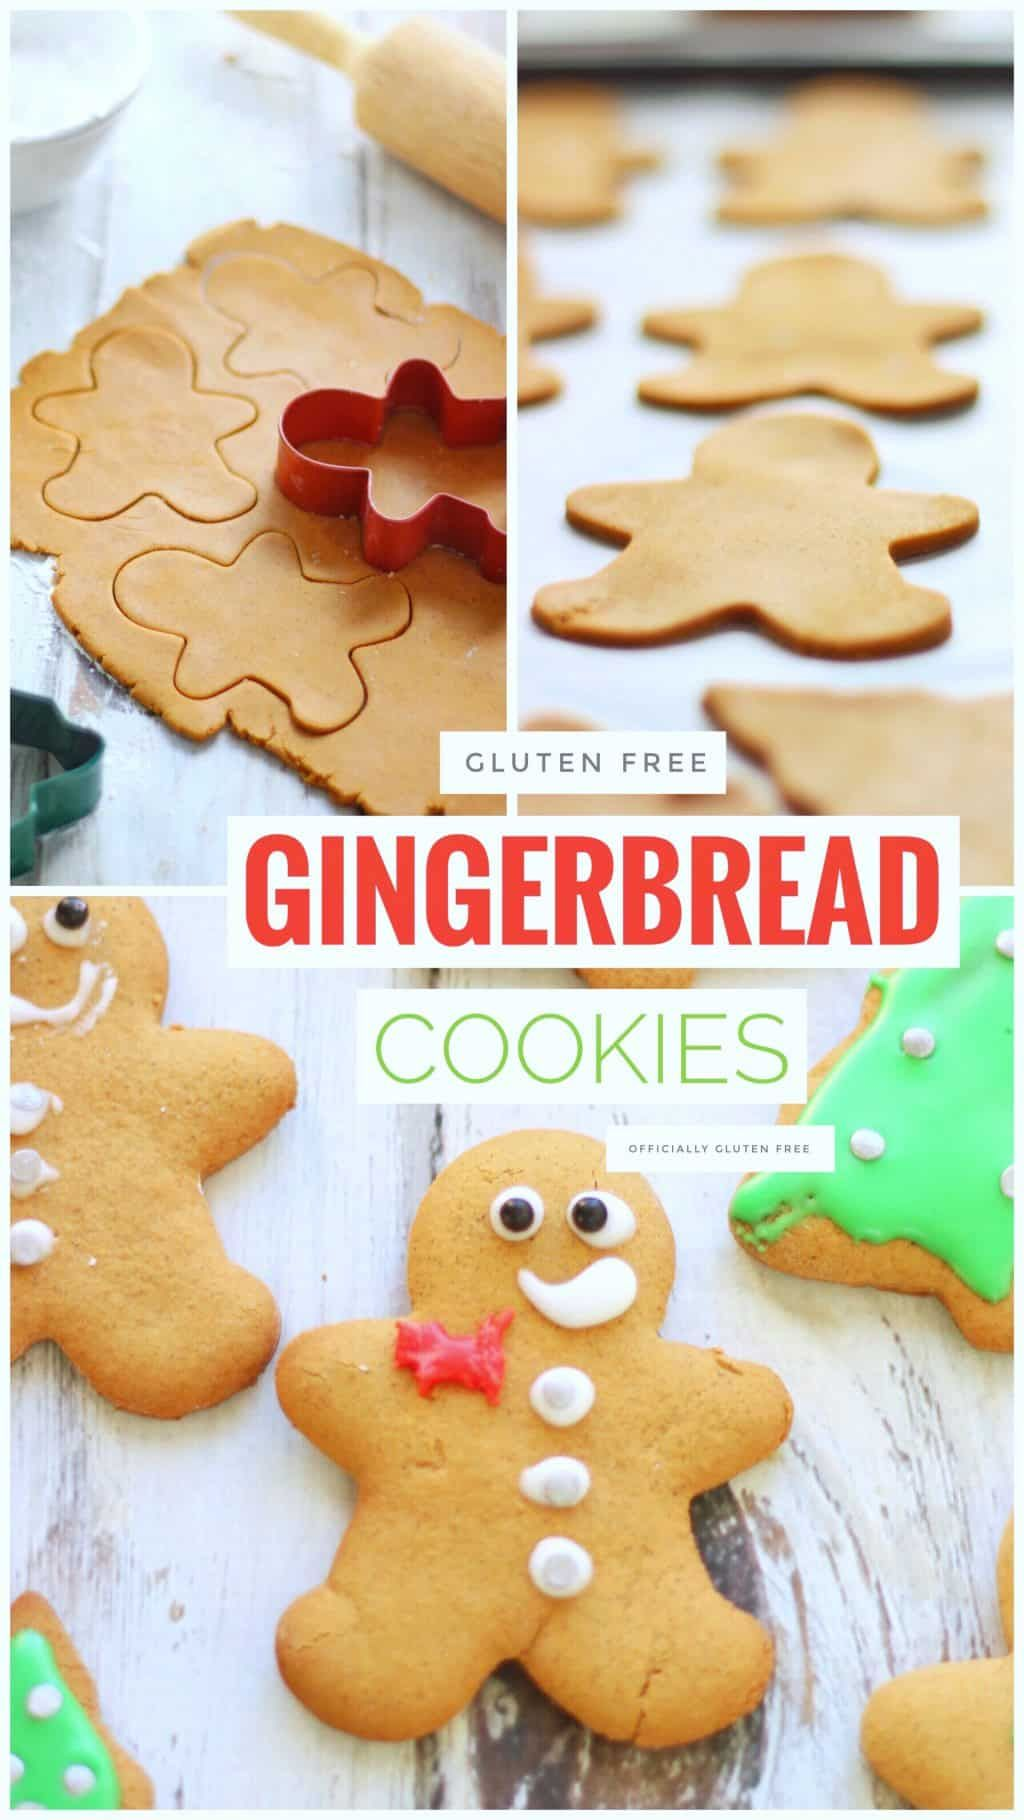 Gluten Free Gingerbread Cookies | Soft Gingerbread Cookie Recipe